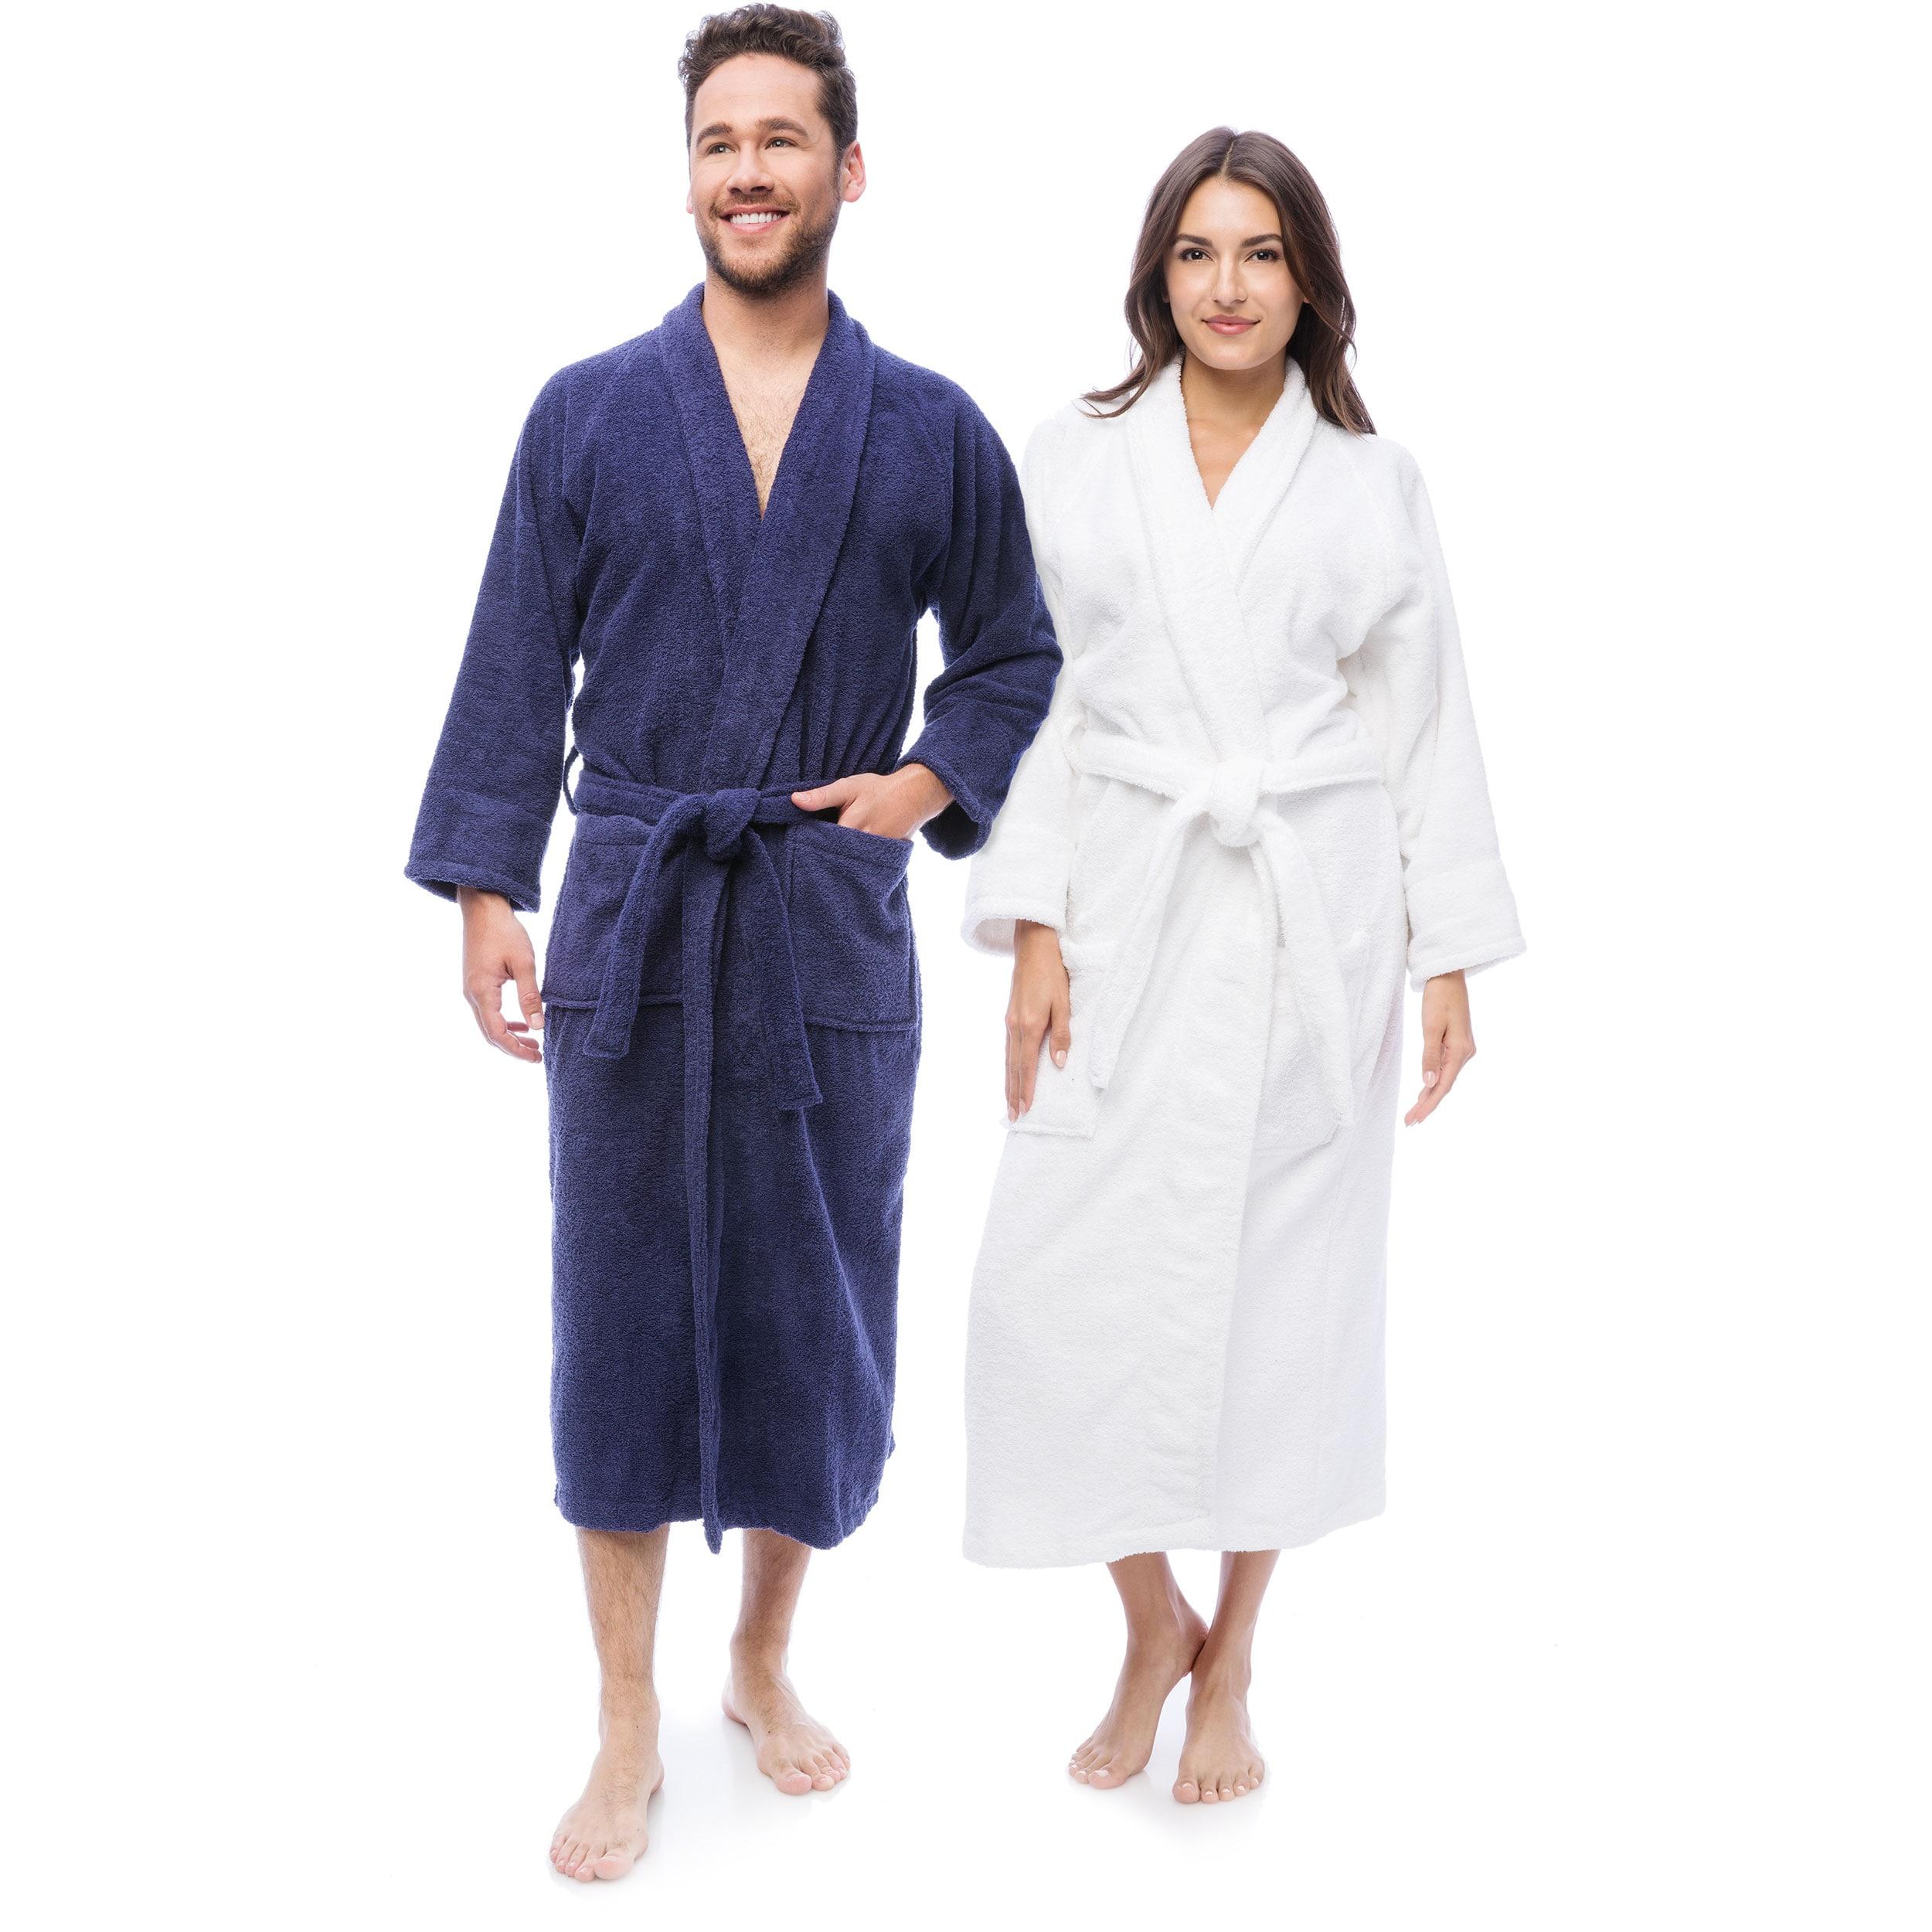 Miccrofiber Bathrobe Spa and Hotel Quality Robe Women Men Unisex